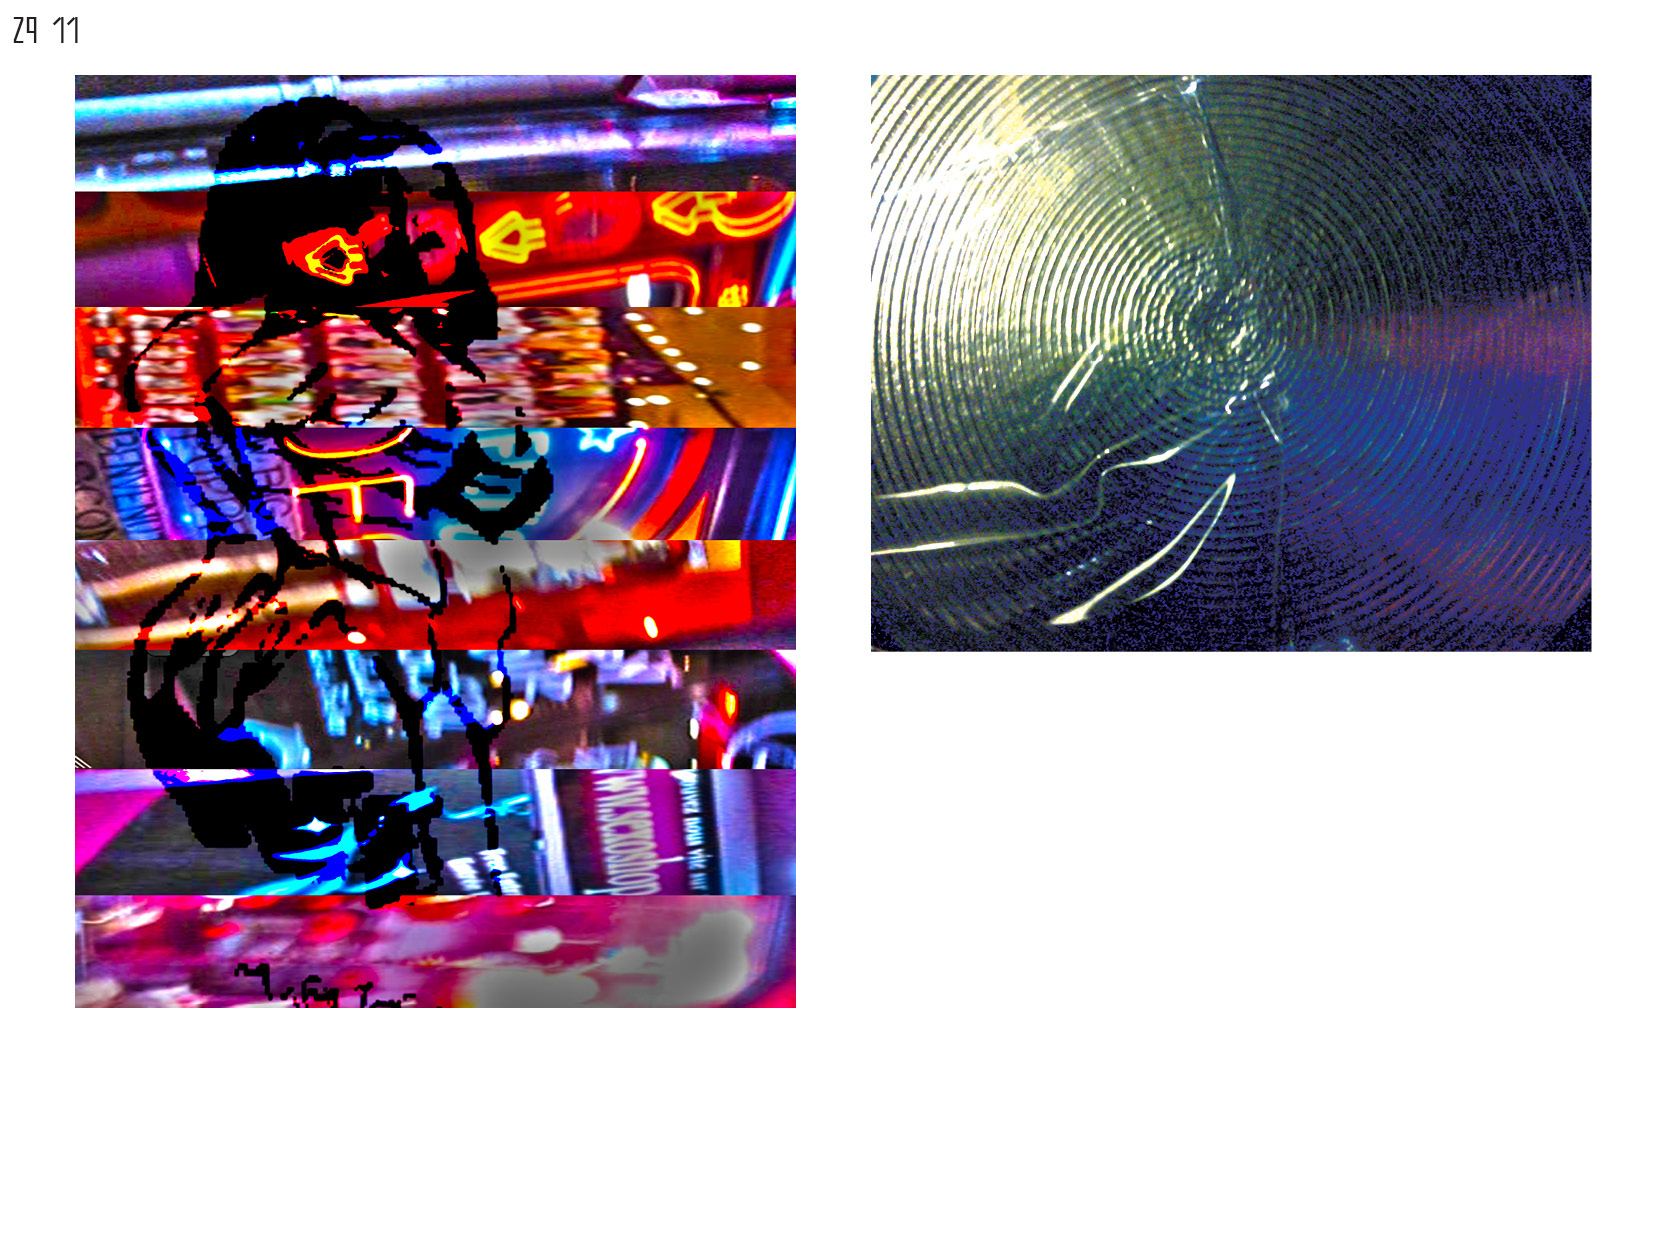 Gerrit-Schweiger-Dialog-Städte-Paris-Berlin-Jessica-Blank-Experiment-Fotoserie-Tagebuch-visuelle-Kommunikation-44